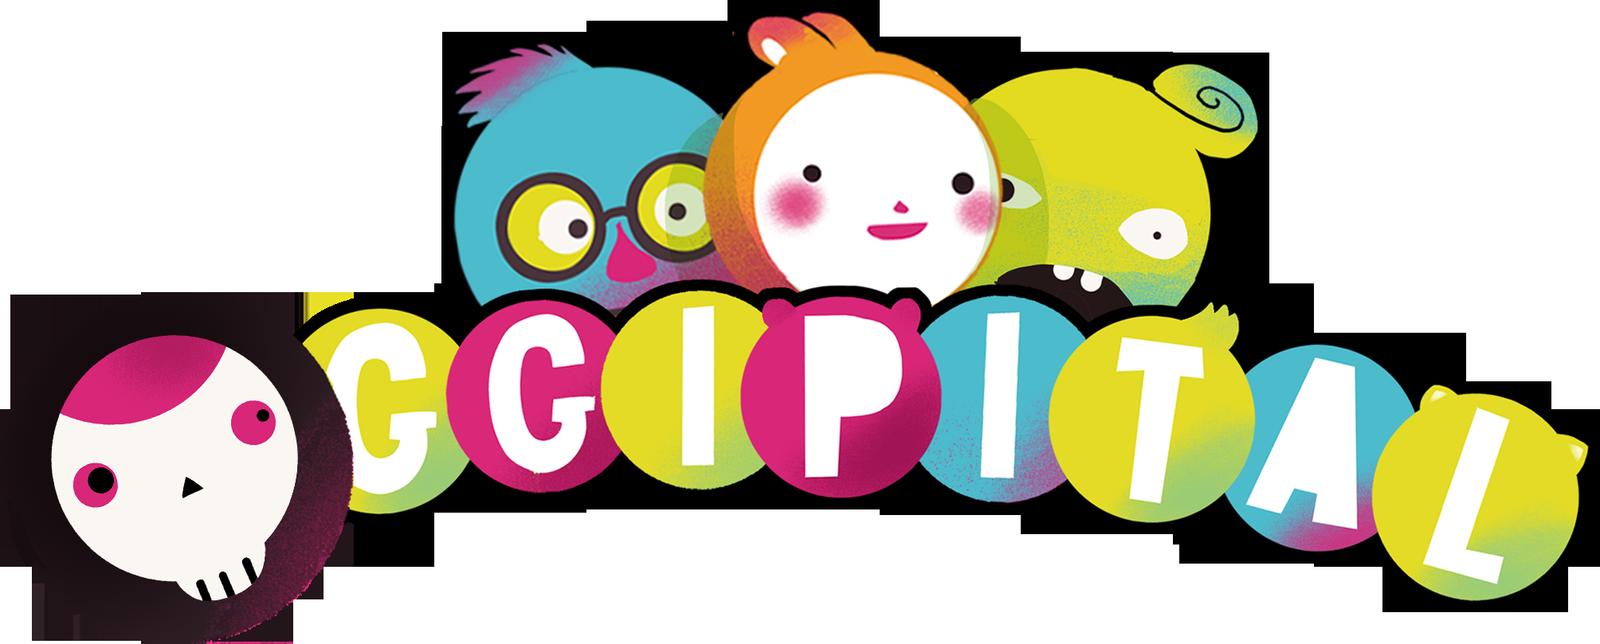 oggipital-logo